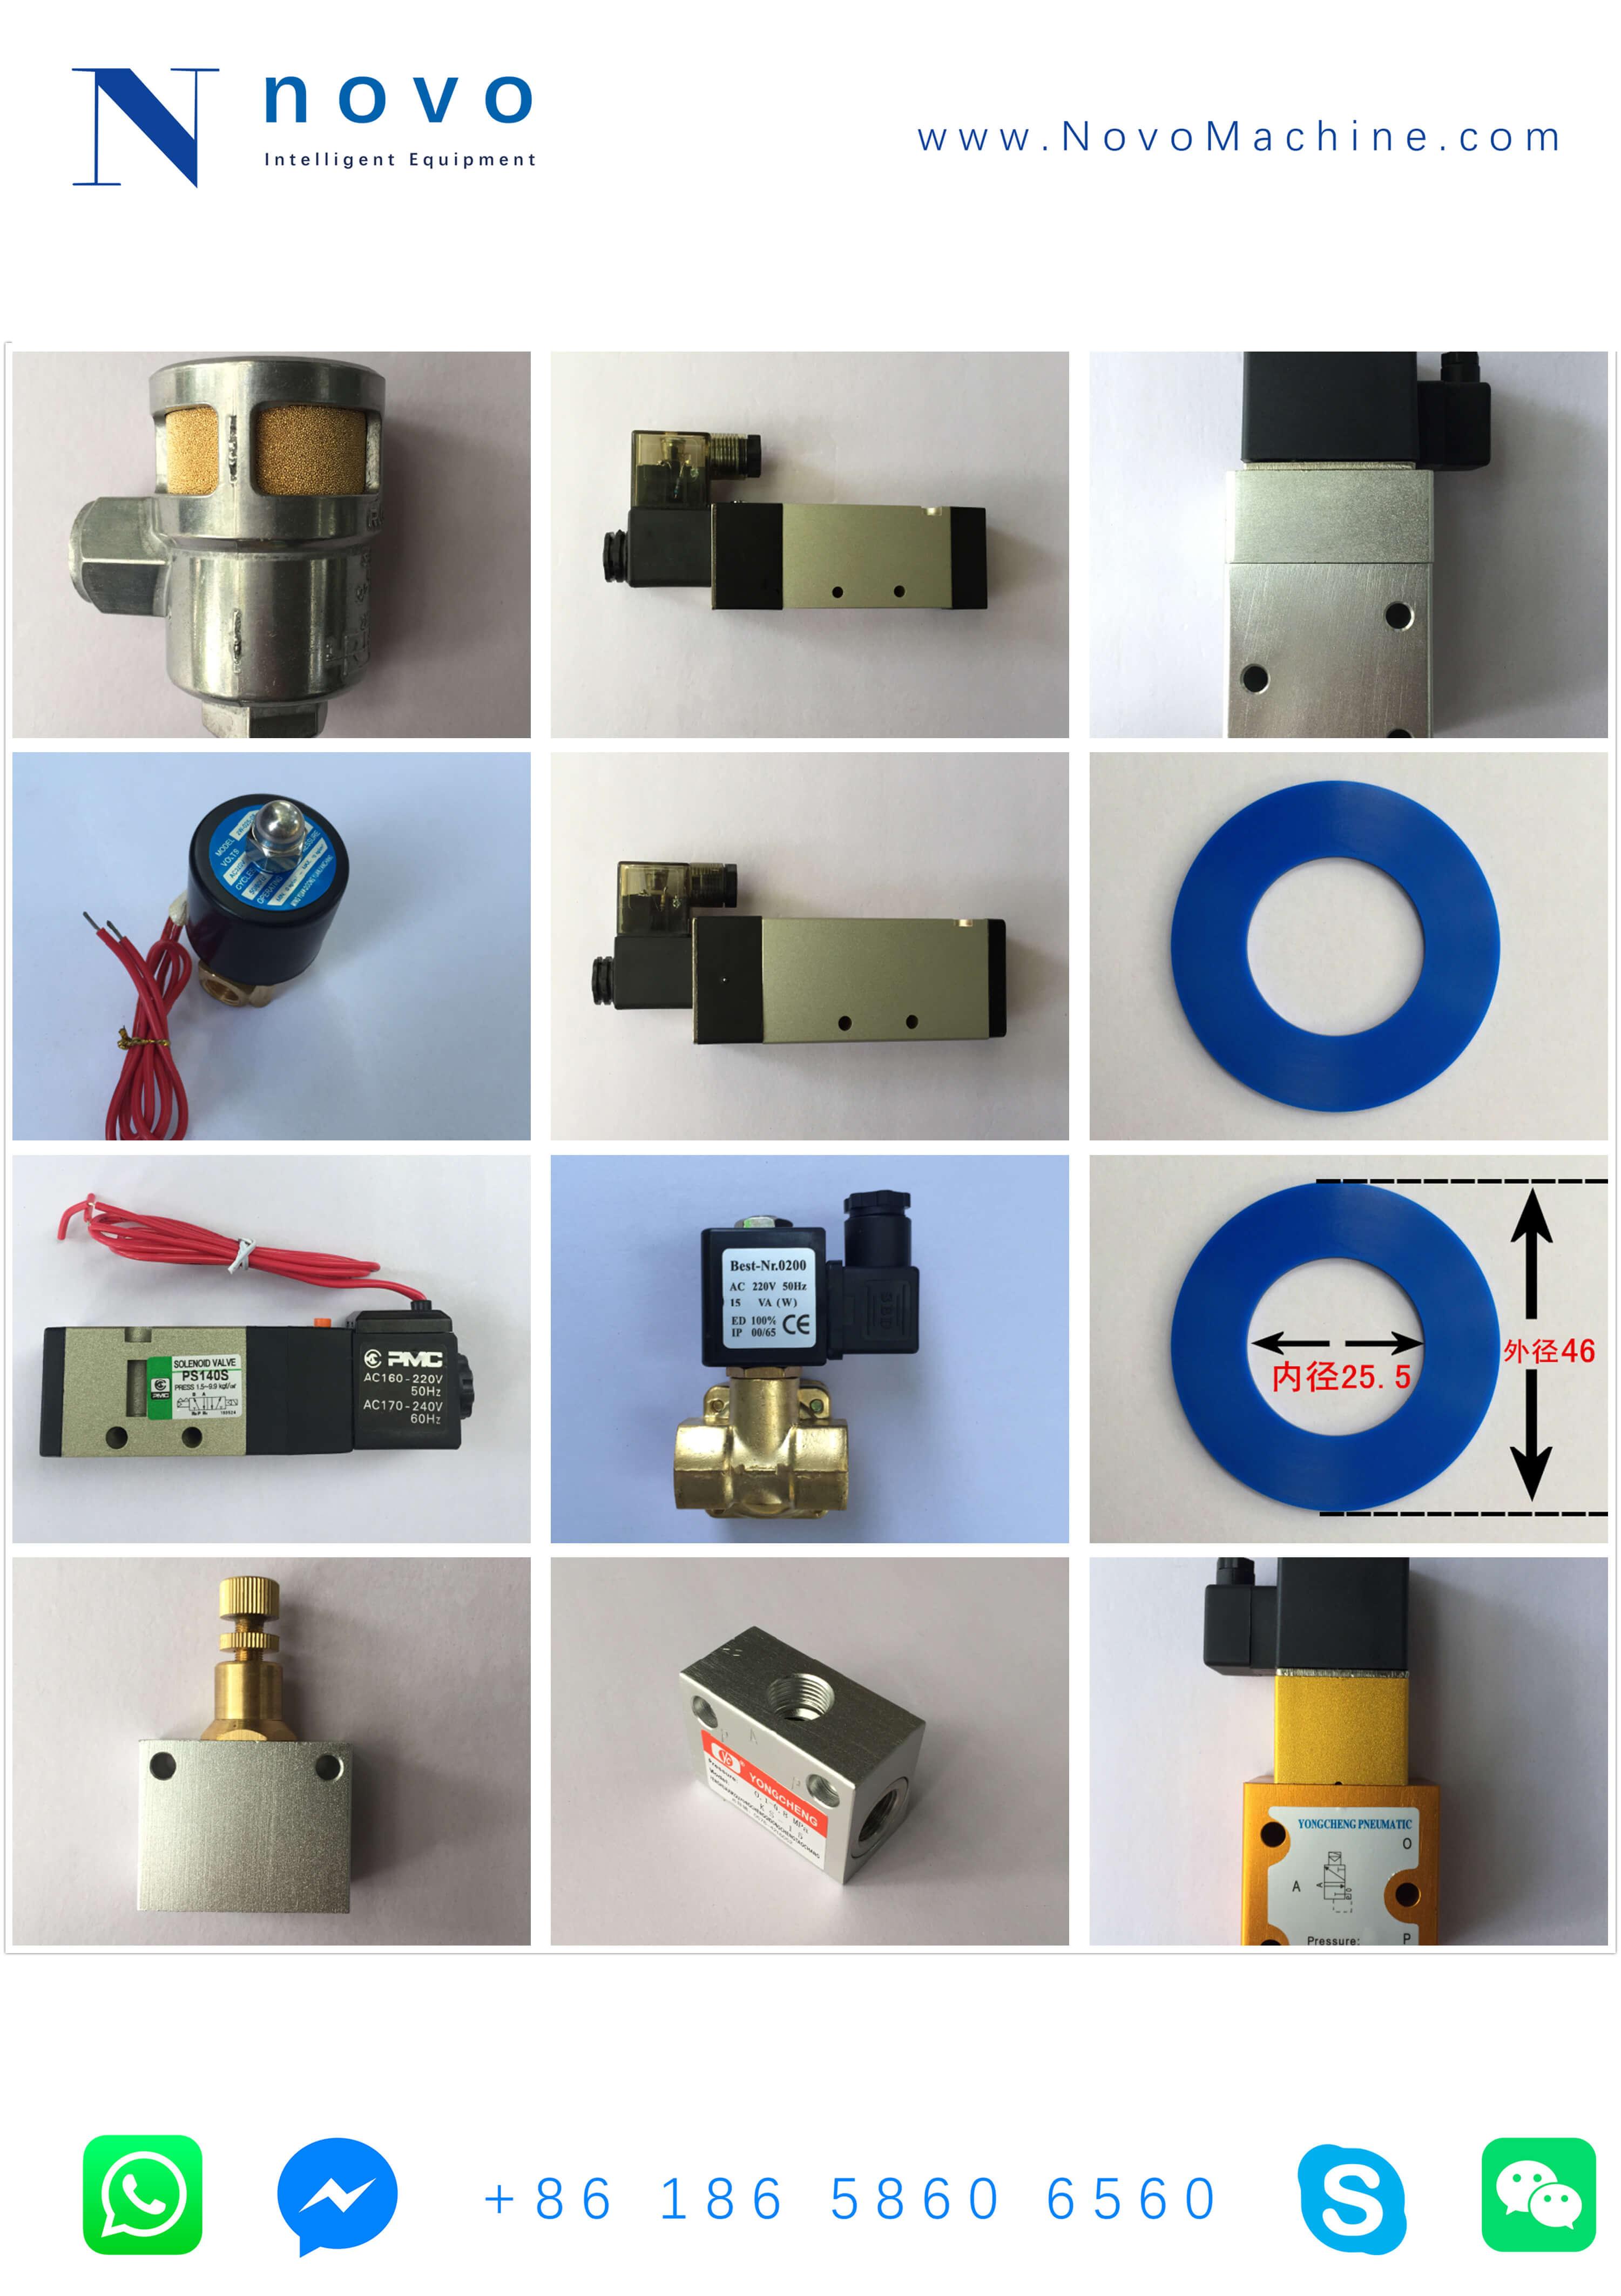 Solenoid-Valve-Spare-parts-for-Novo-PET-bottle-injection blowing-molding-machine